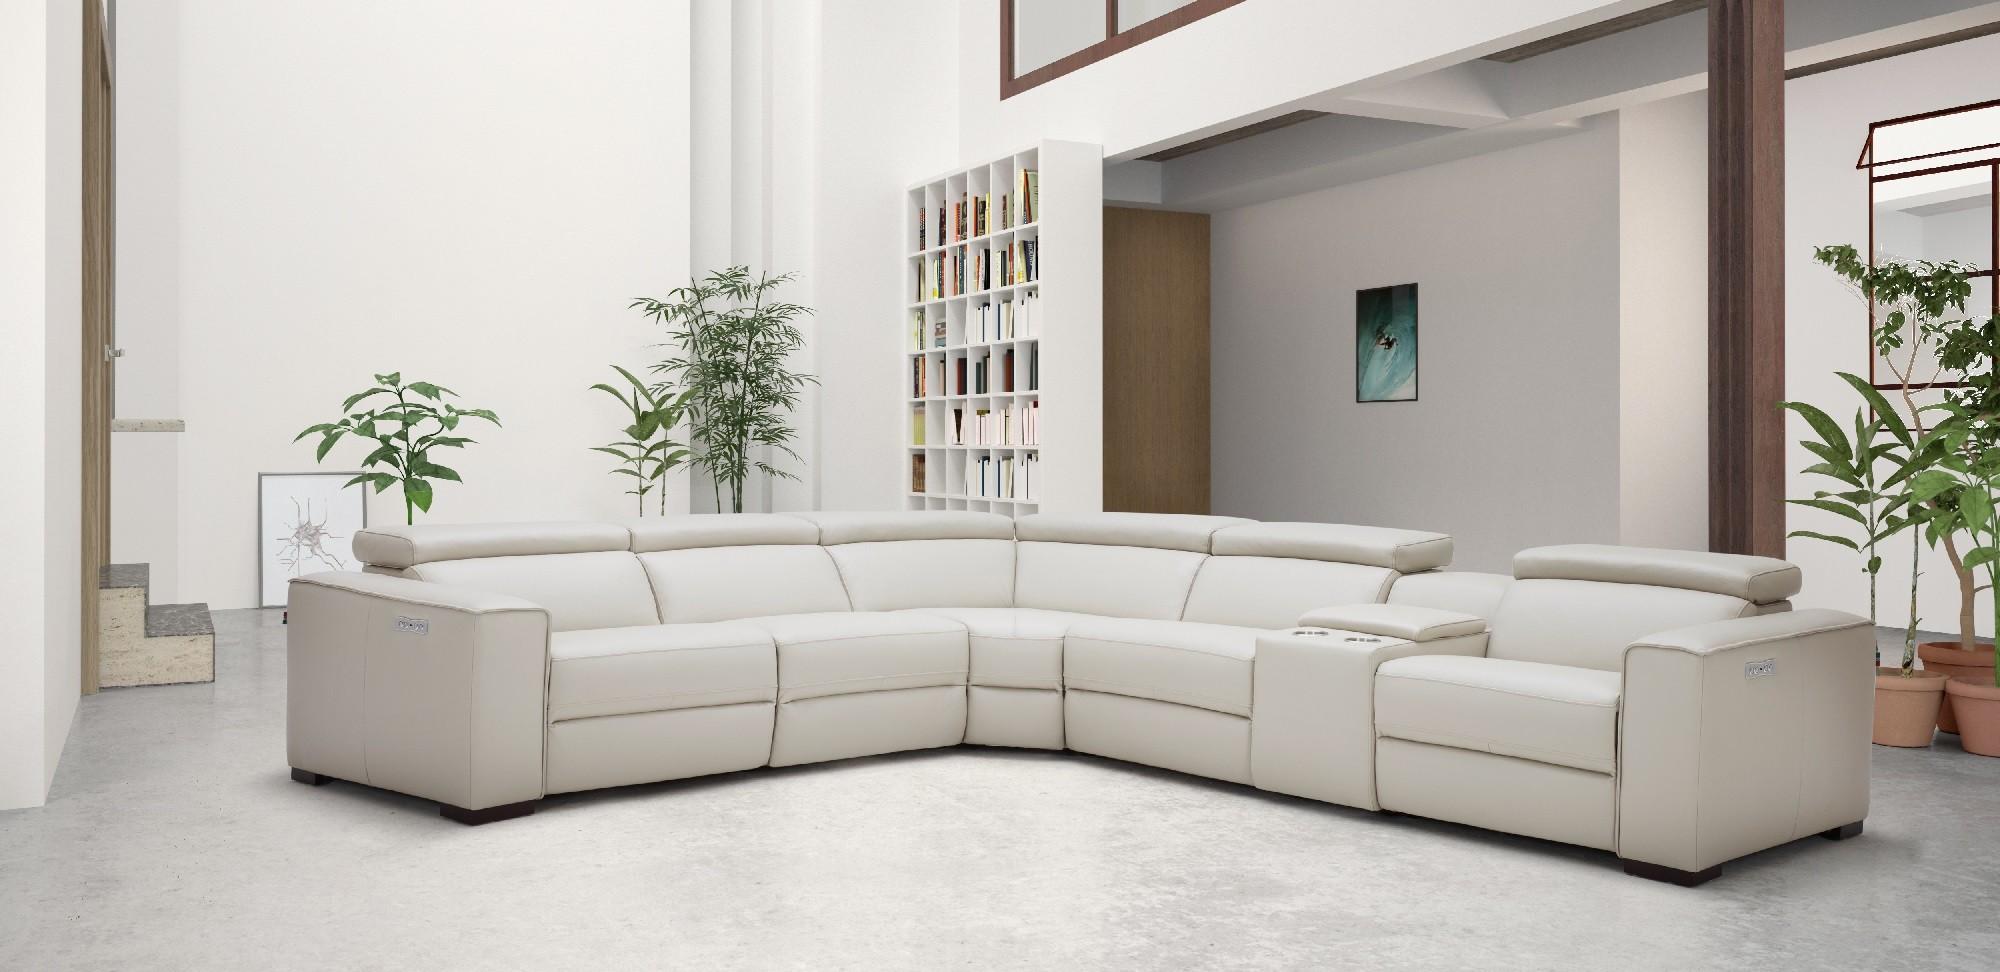 Unique Leather Upholstery Corner L Shape Sofa